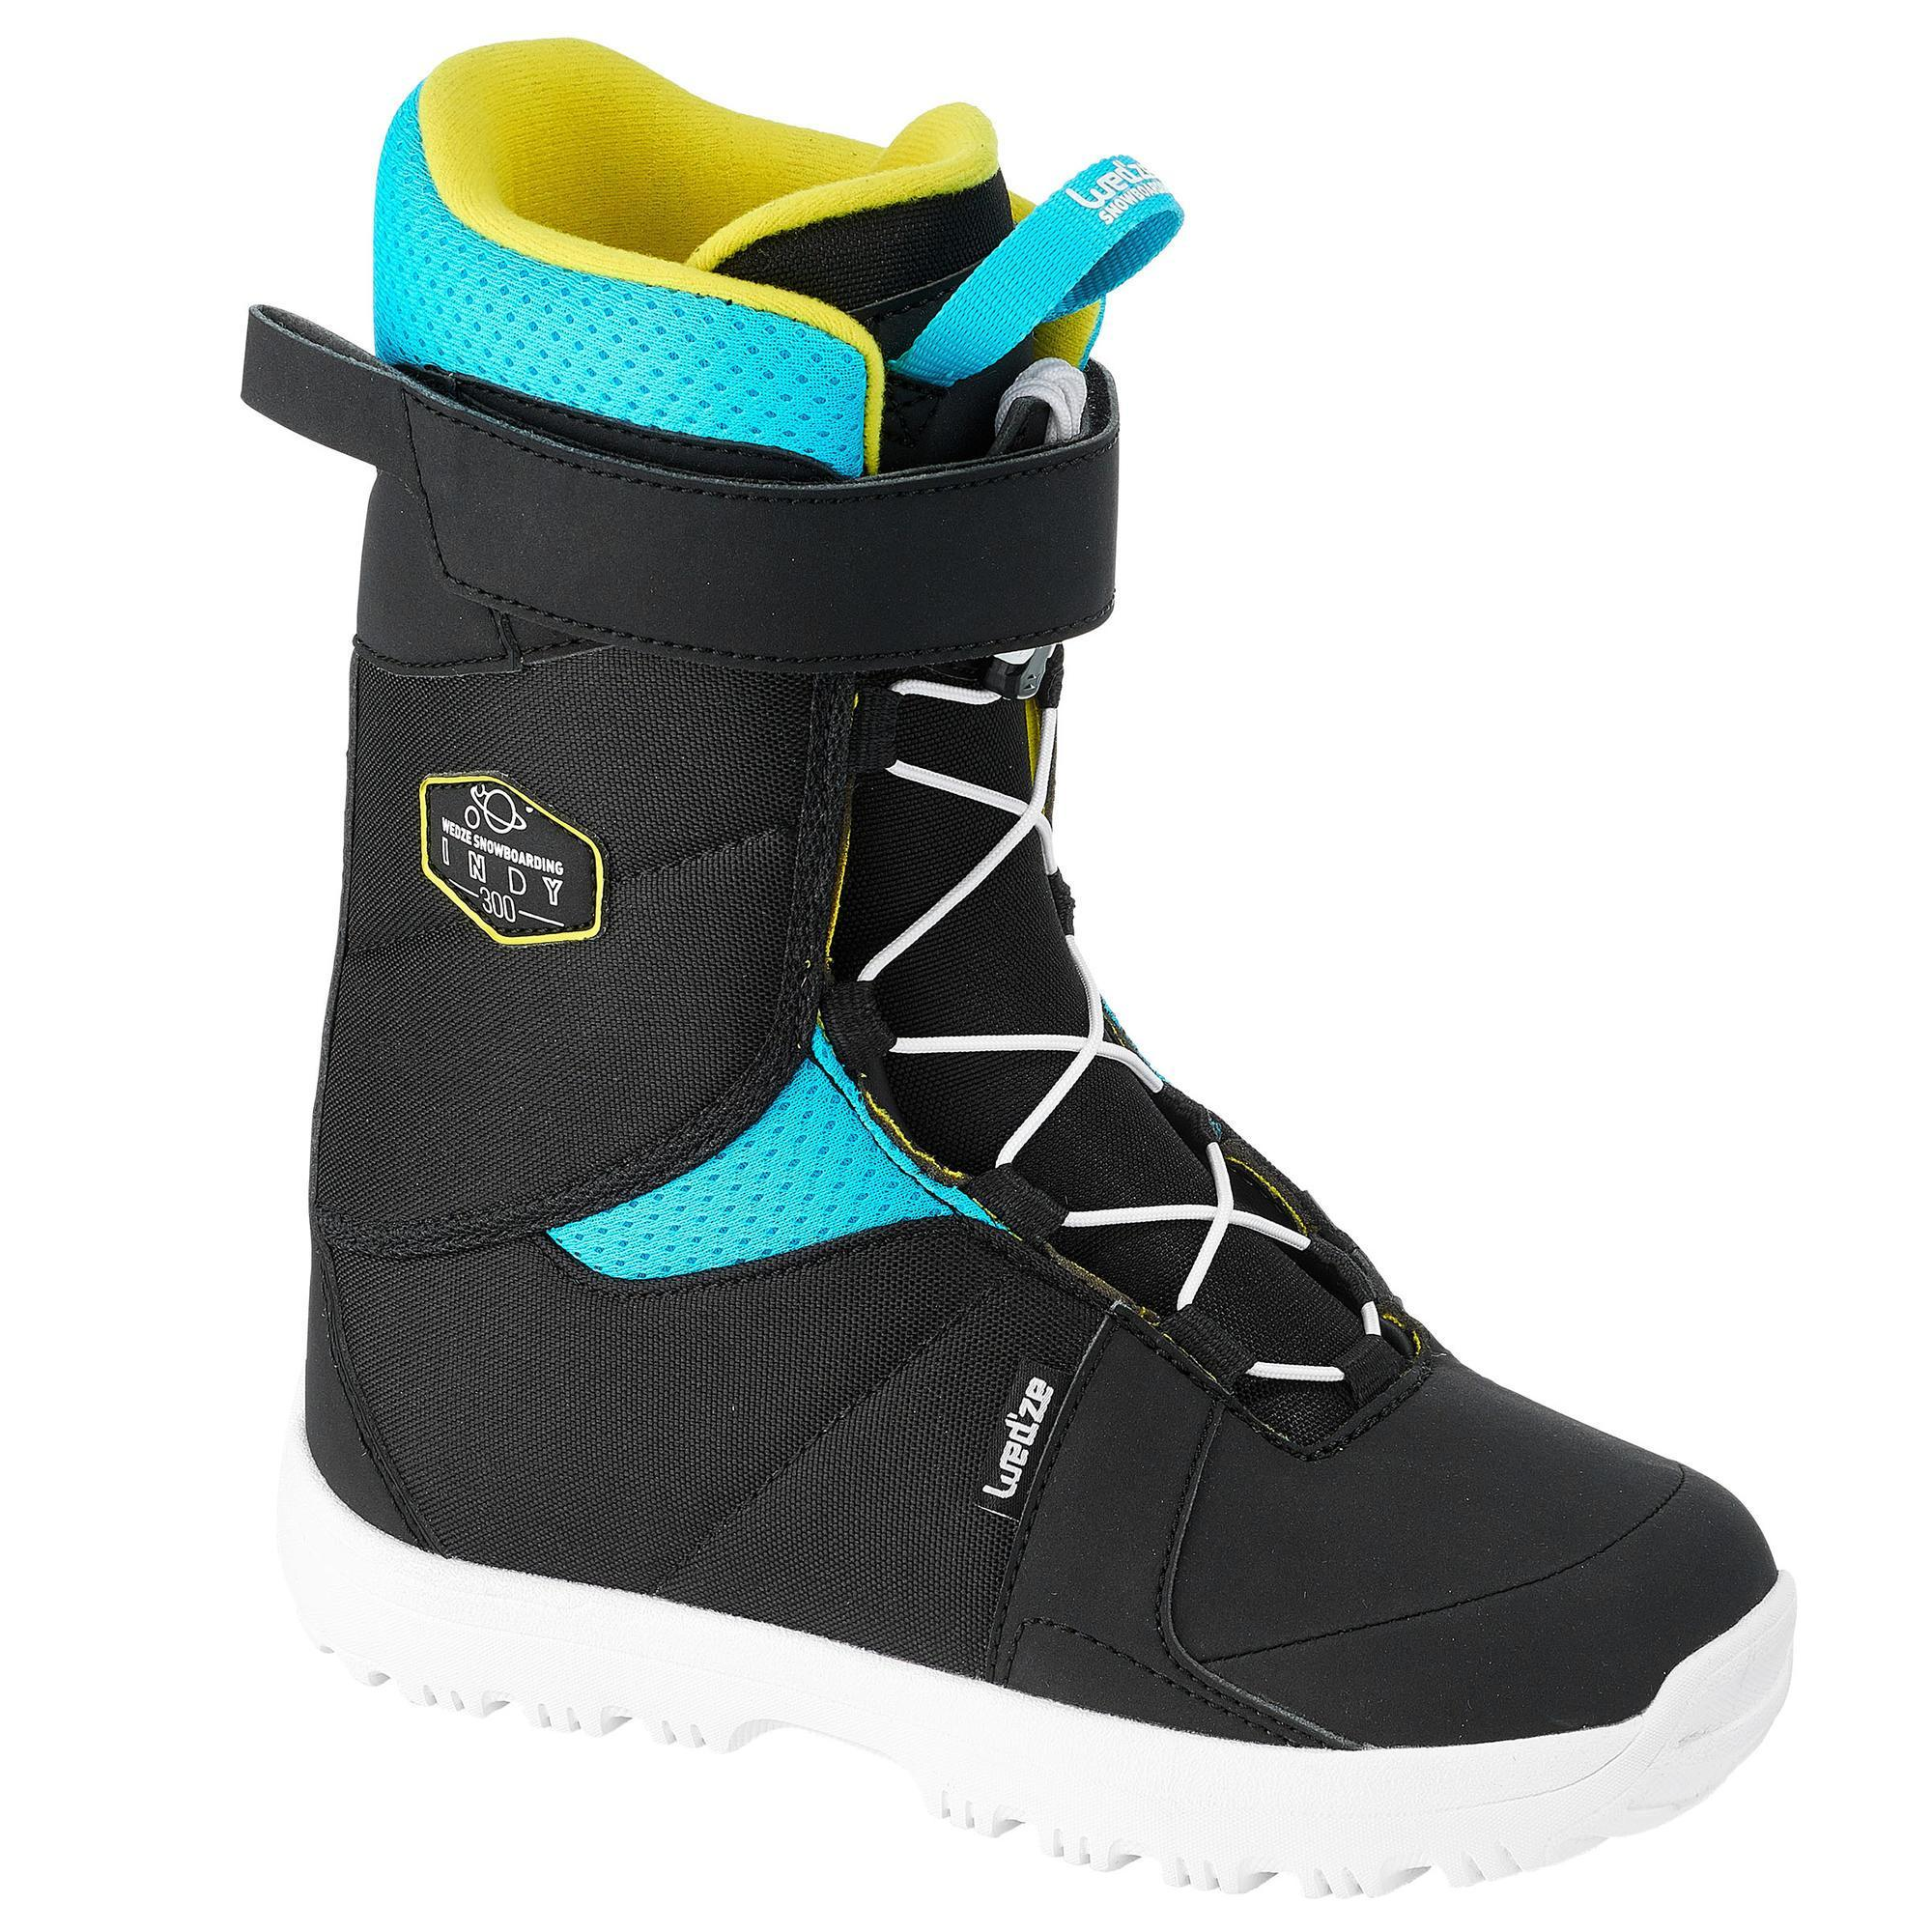 Jungen,Kinder,Kinder Snowboardschuhe Fast Lock 2Z Indy 300 Kinder (Größen:34-38)blau gelb | 03608449879552